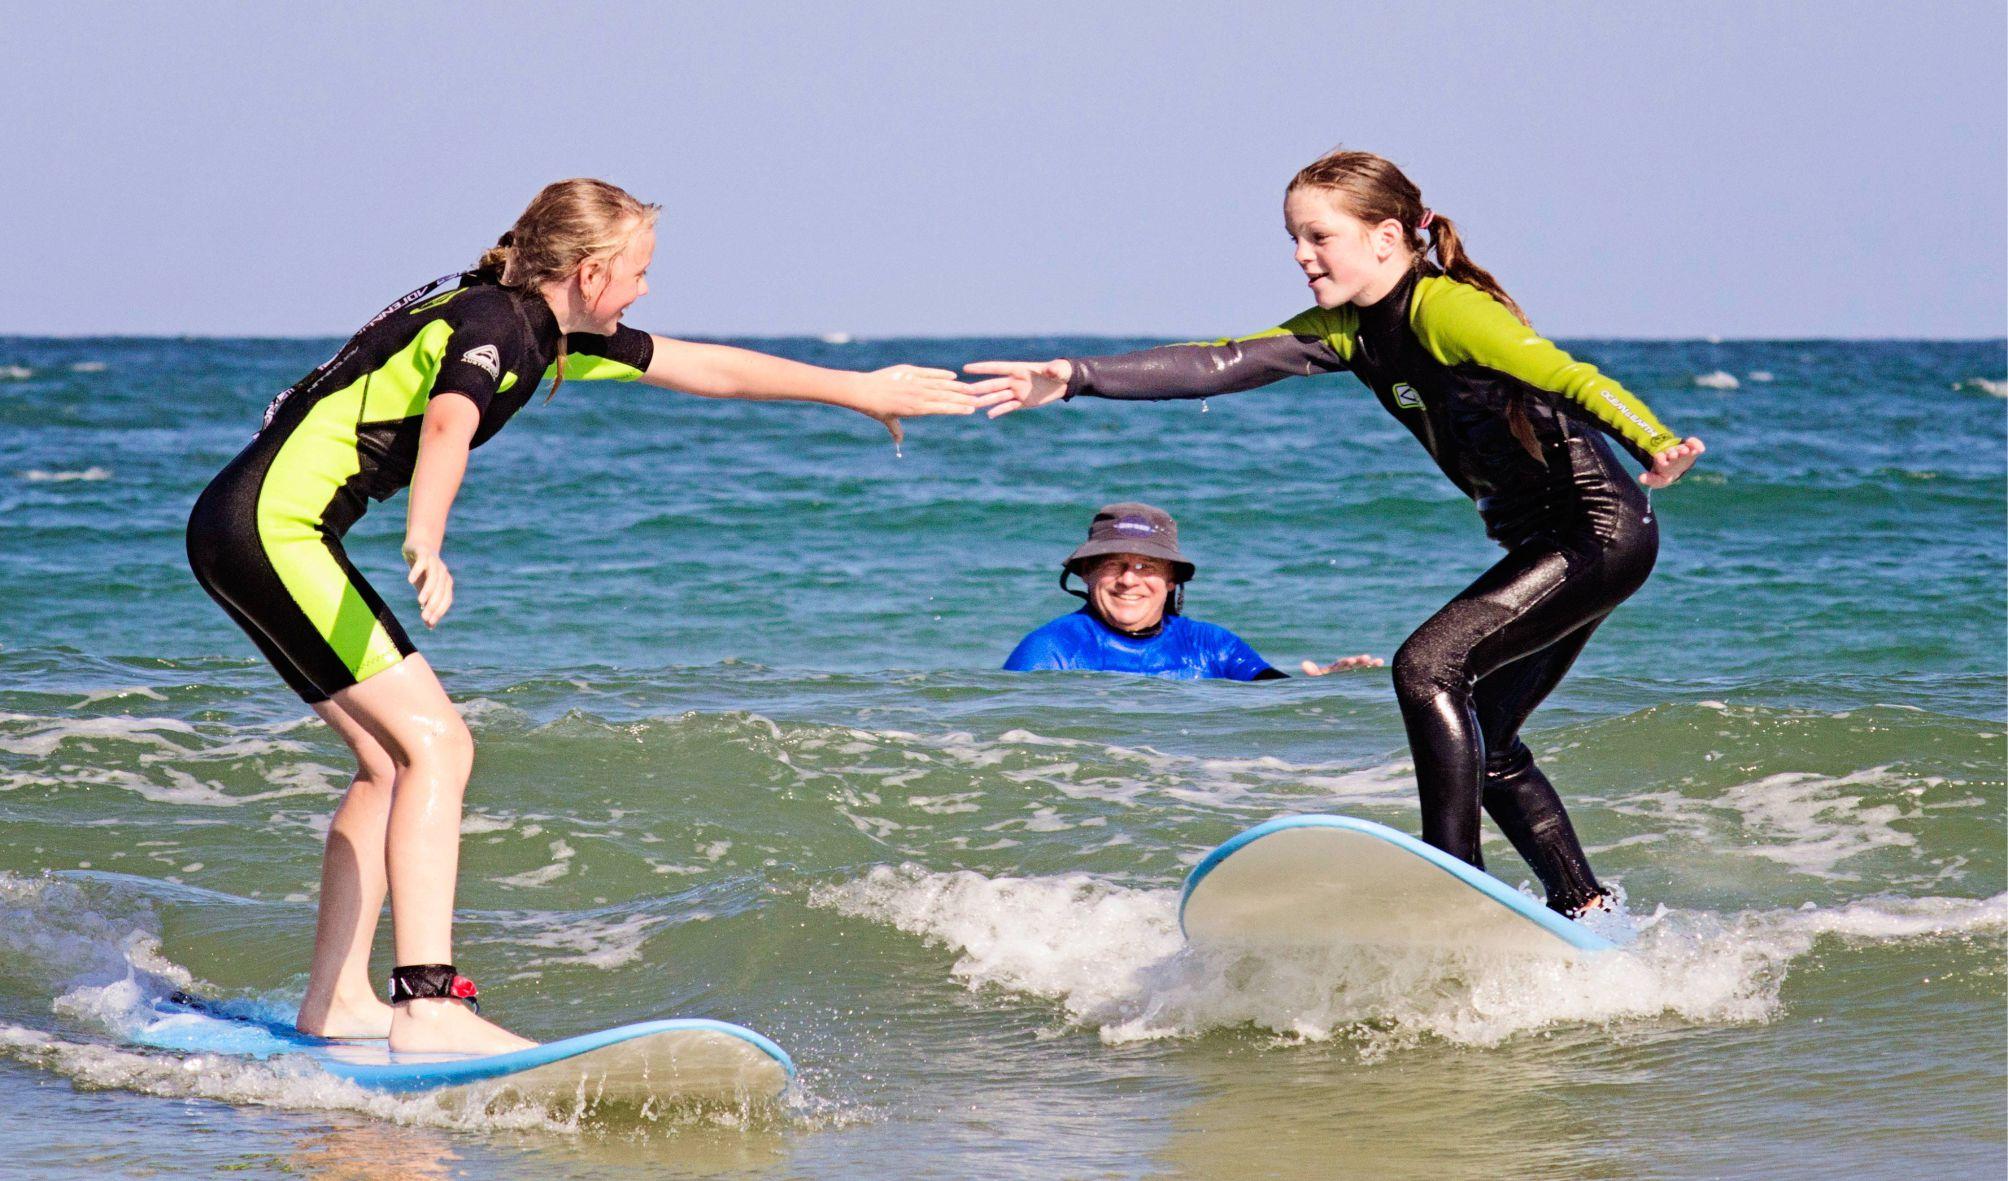 best friends surf together